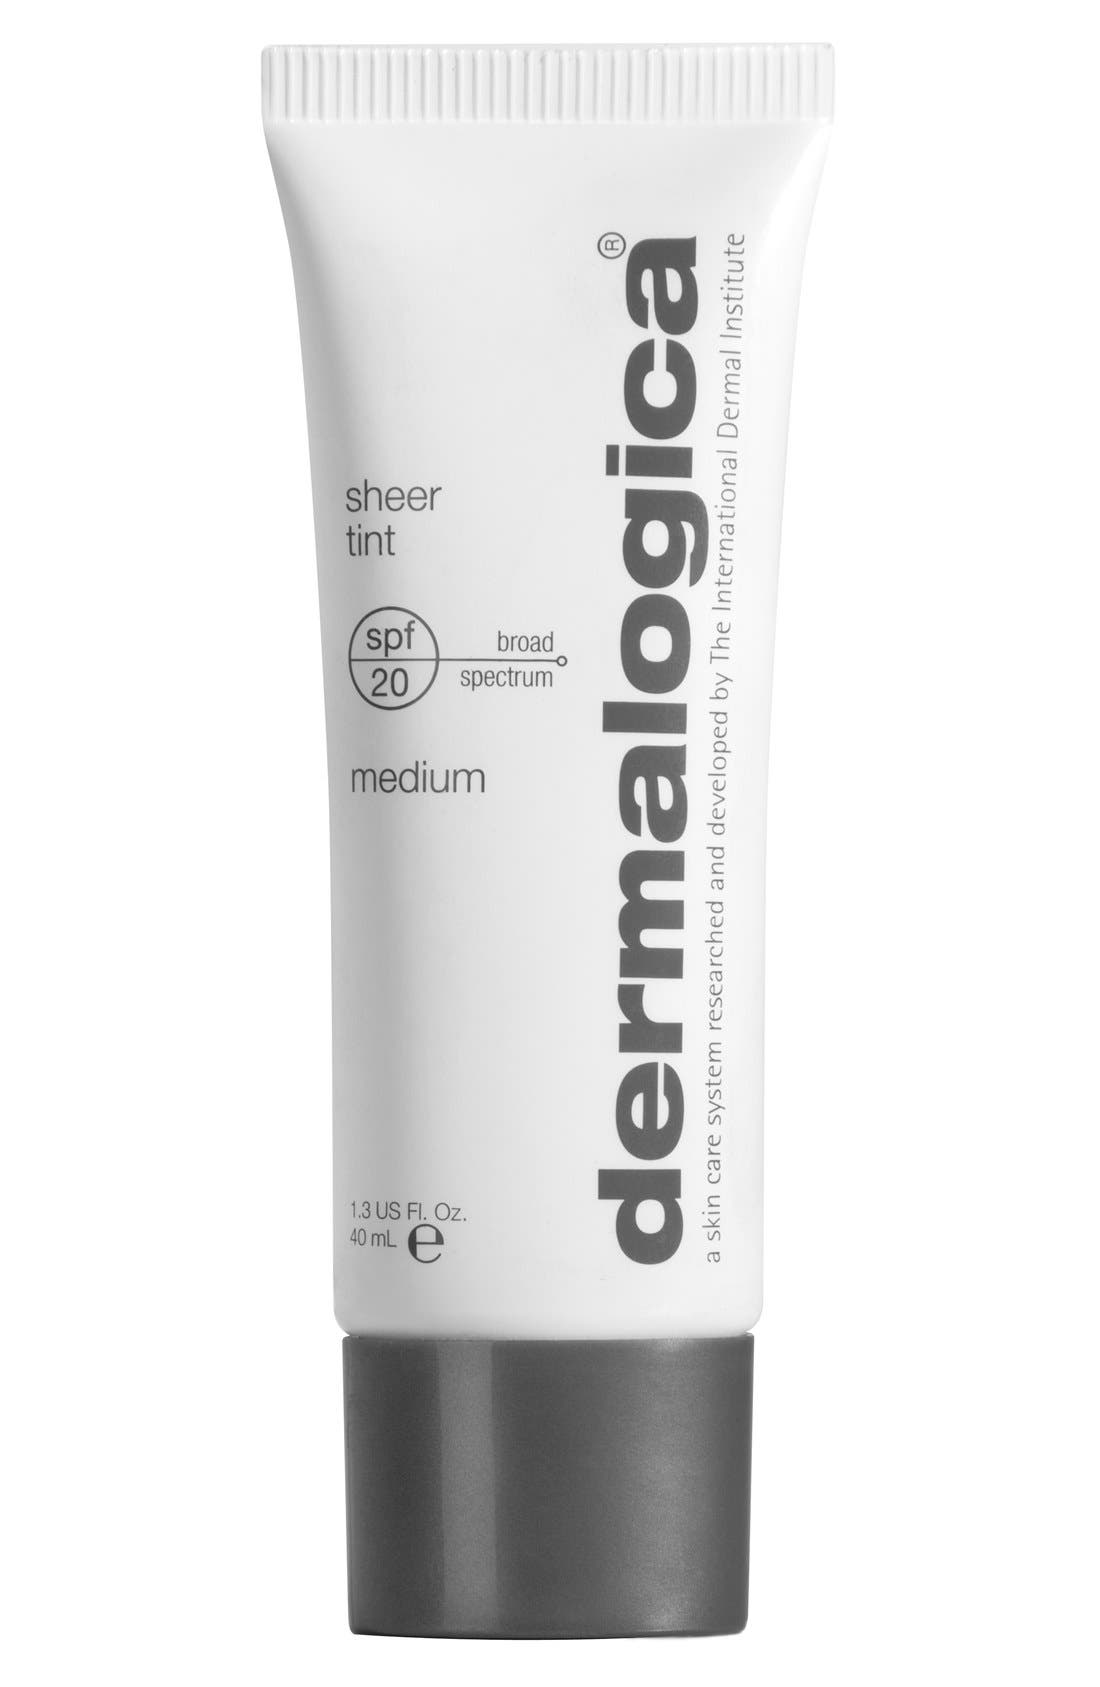 dermalogica® Sheer Tint SPF 20